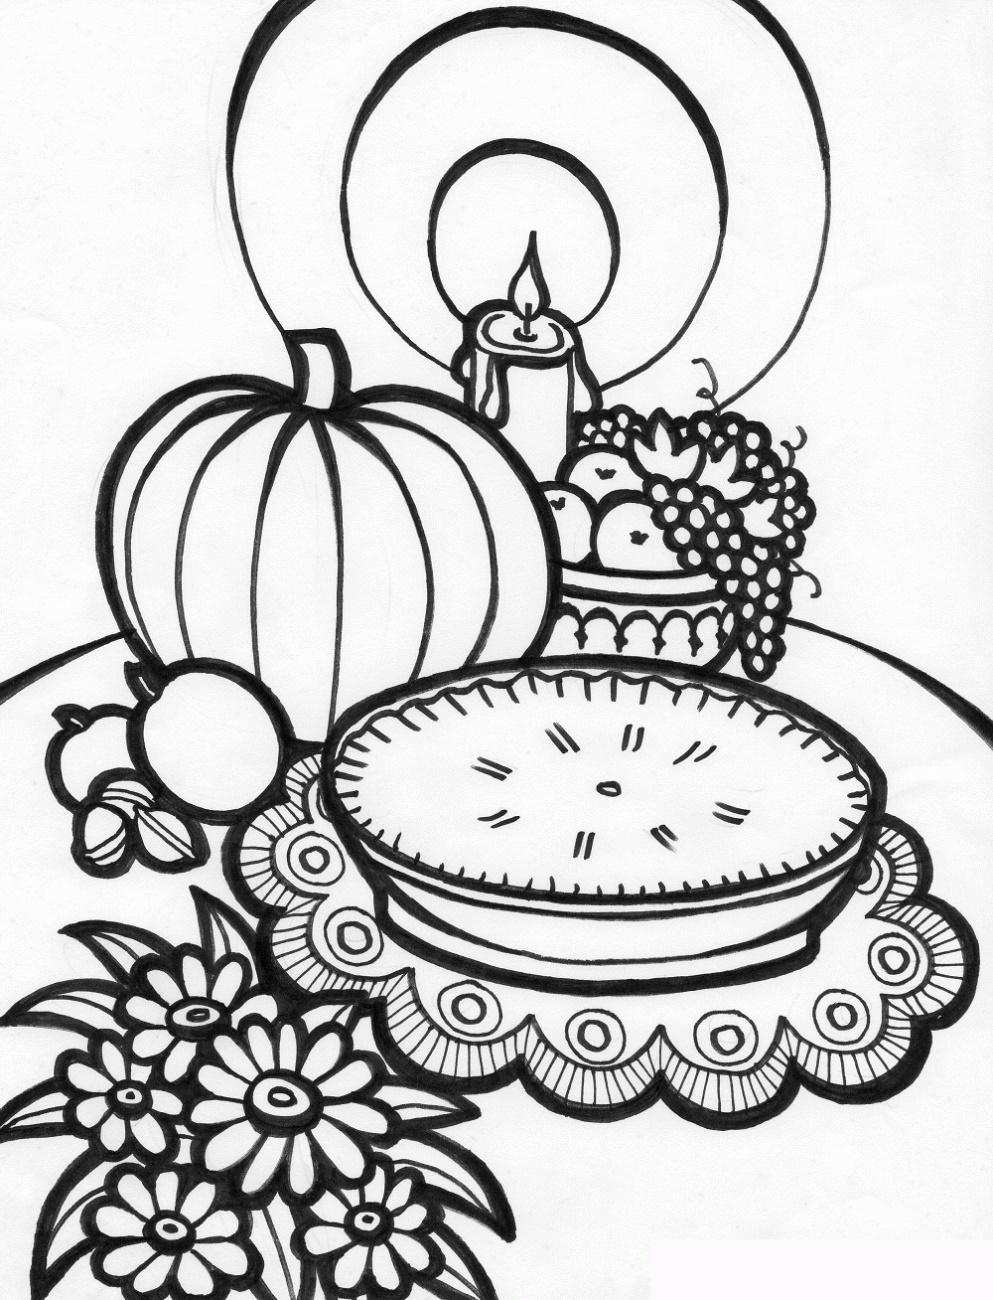 Thanksgiving Coloring Sheets 2019 Thanksgiving Coloring Sheets Thanksgiving Coloring Pages Coloring Pages [ 1300 x 993 Pixel ]